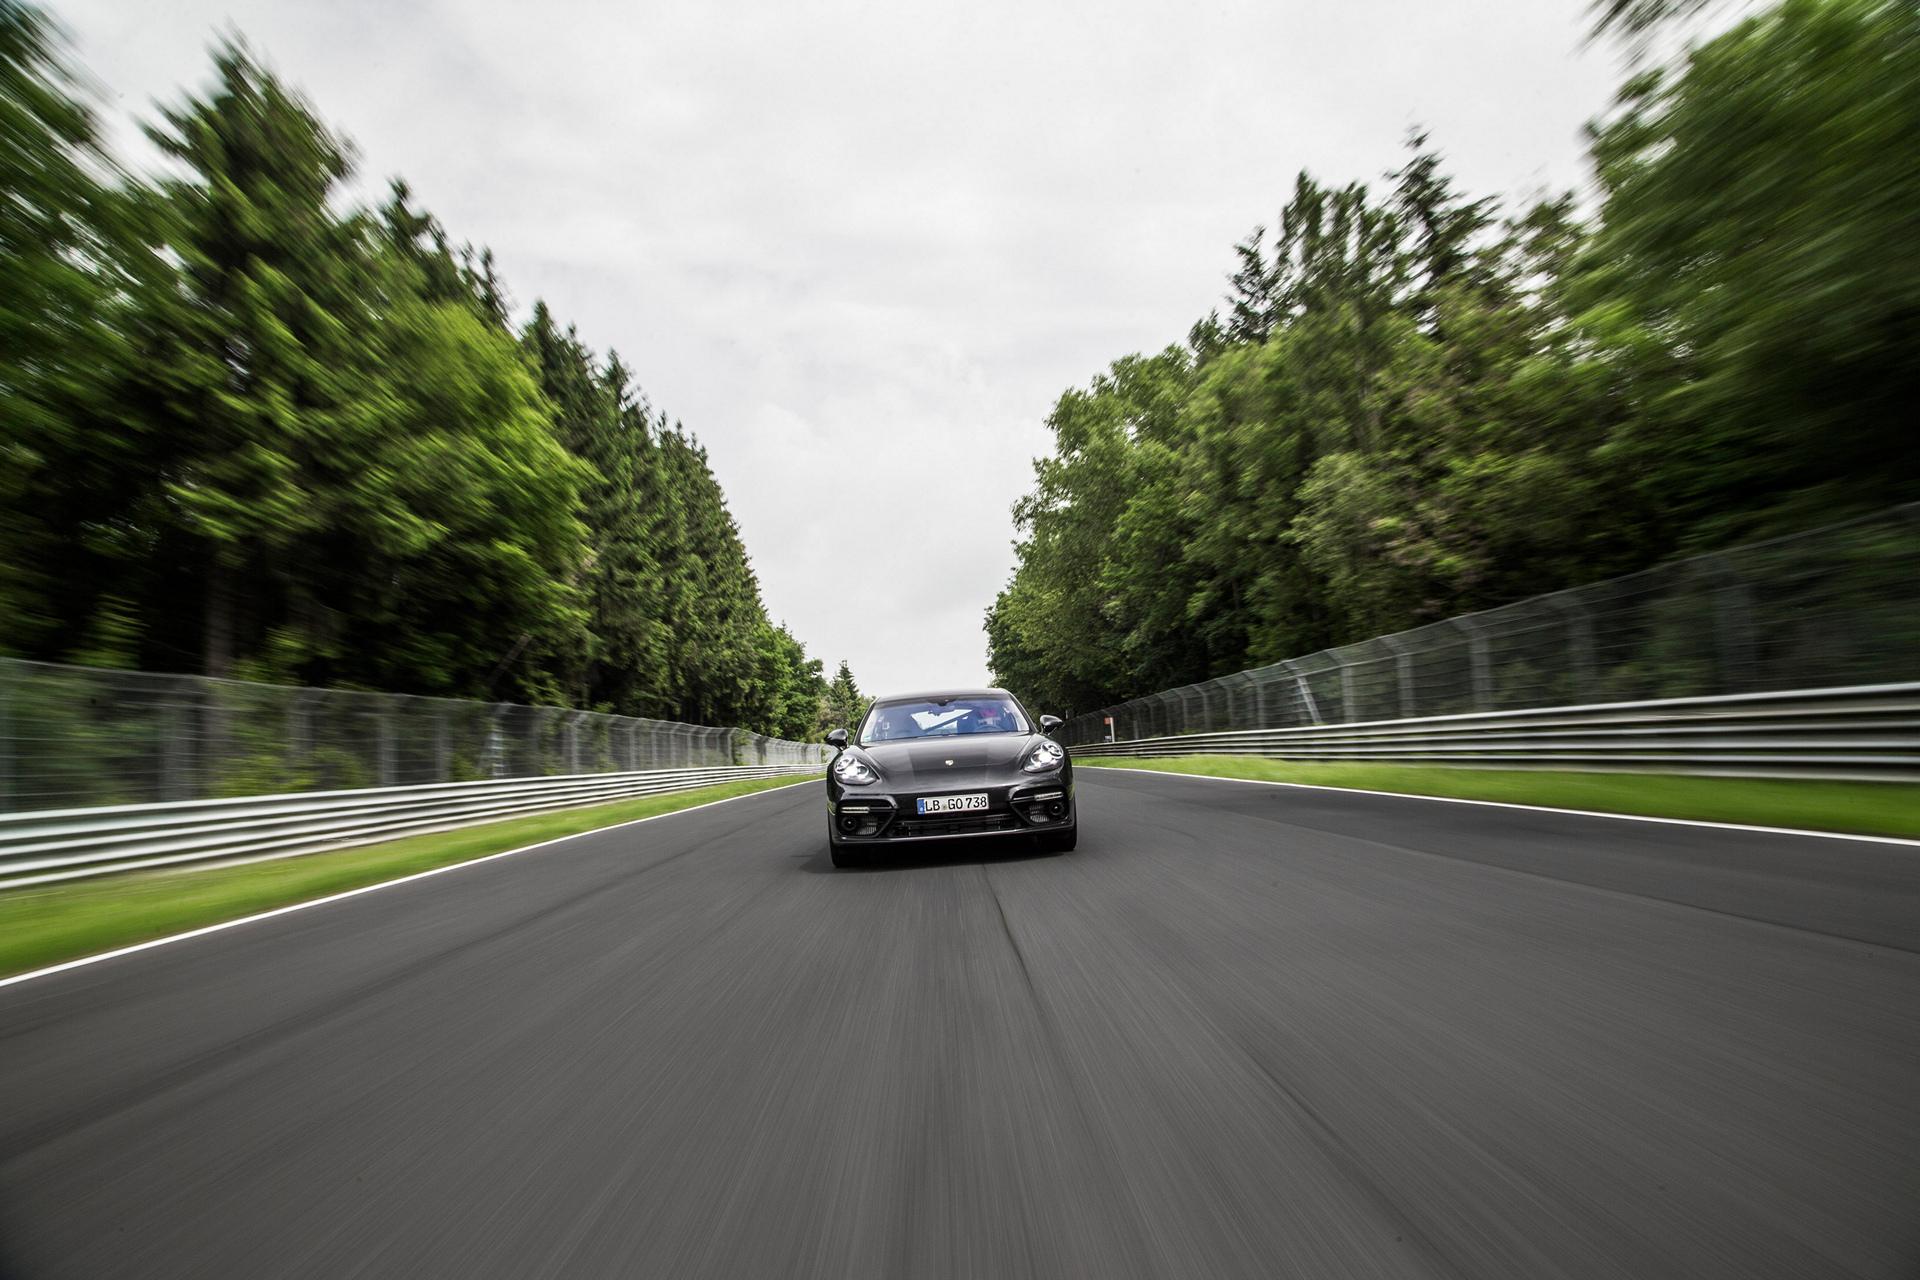 Porsche Panamera Turbo © Dr. Ing. h.c. F. Porsche AG